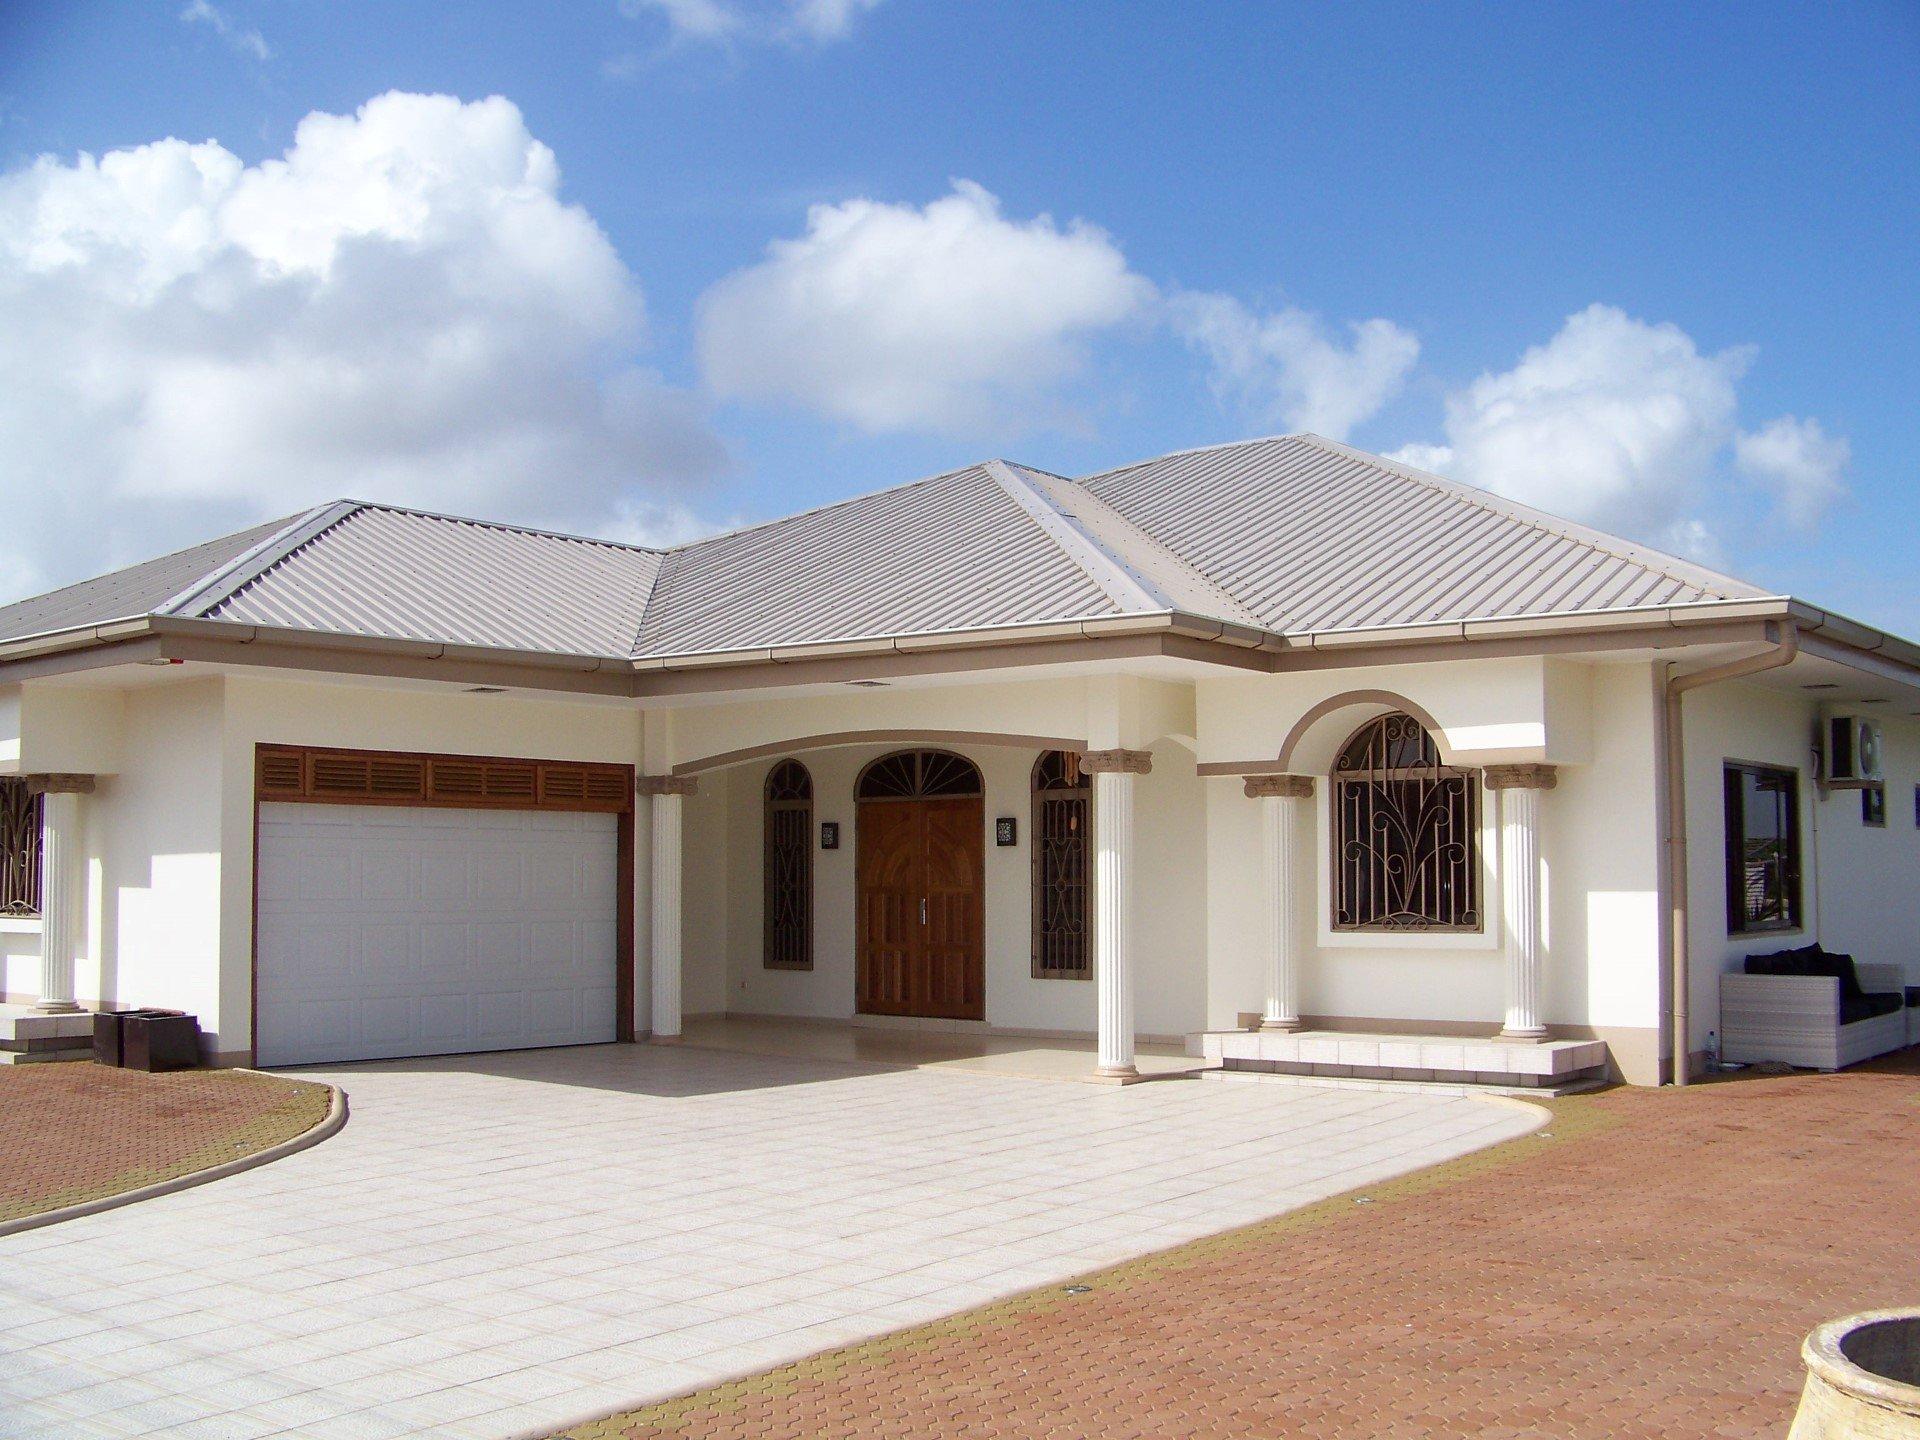 Paulus E.P. Indiaanstraat - Paramaribo - Noord - Surgoed Makelaardij NV - Paramaribo, Suriname